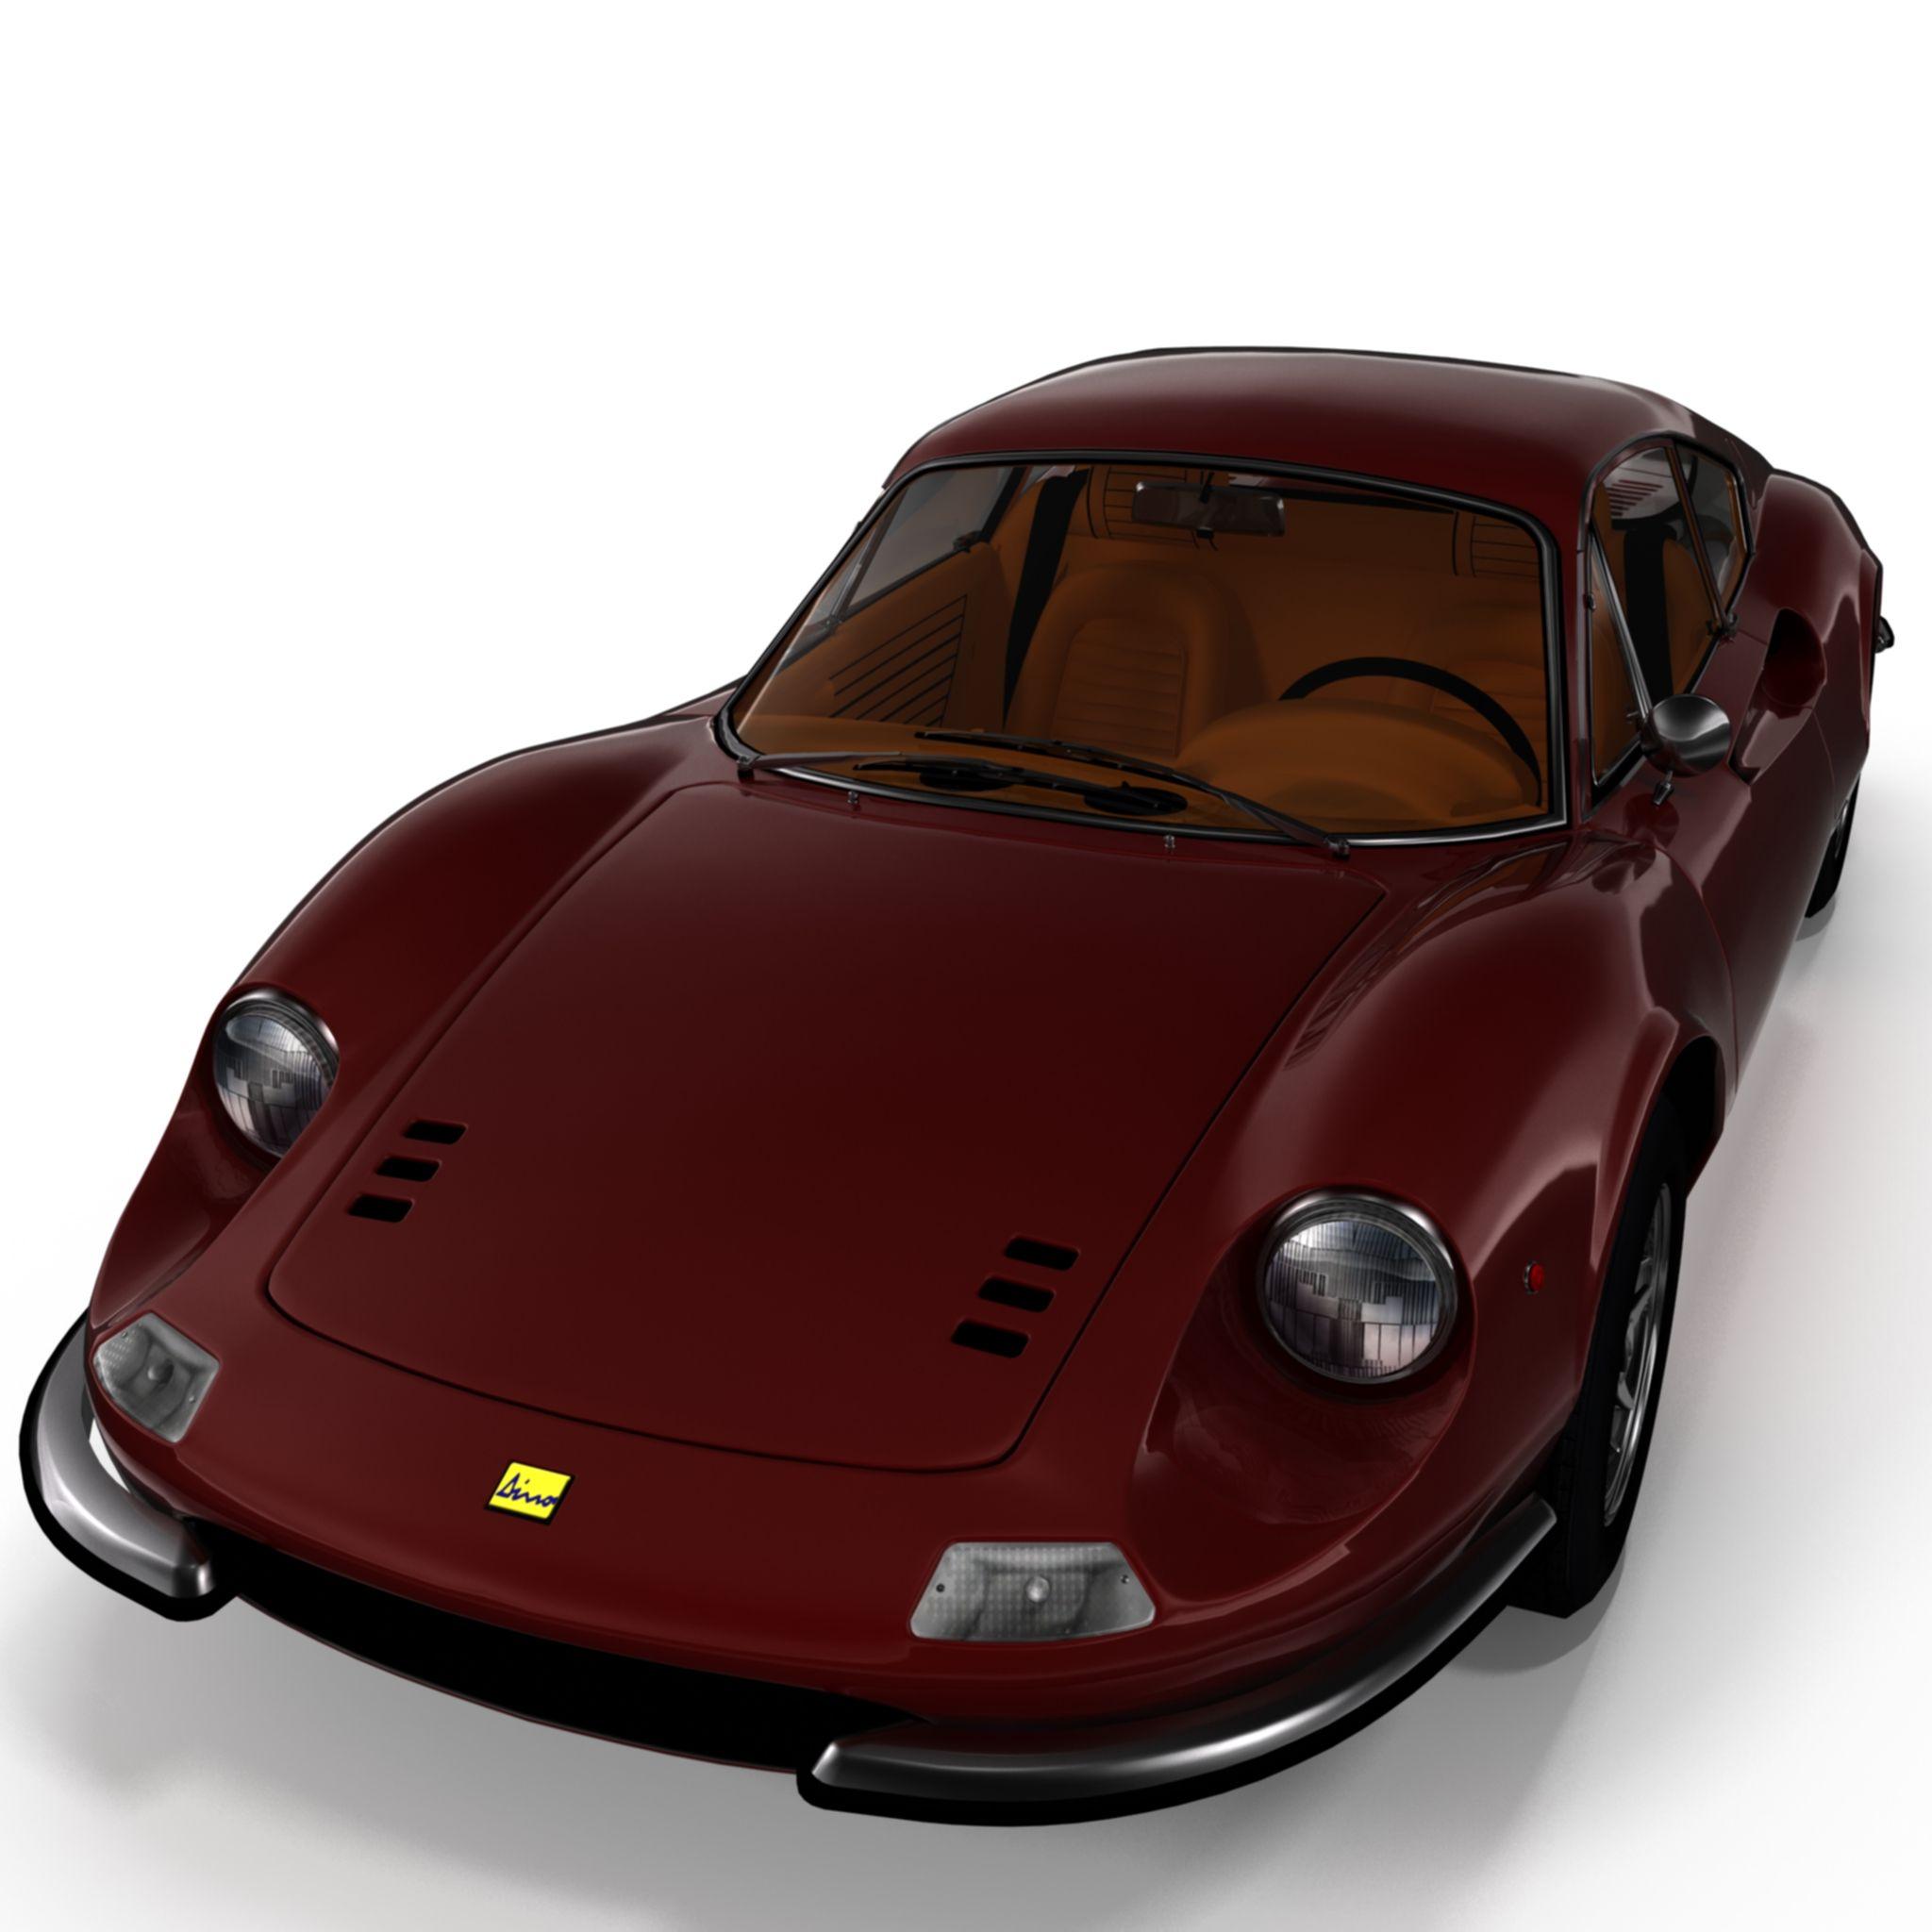 Ferrari-dino-246gt-25-3500-3500